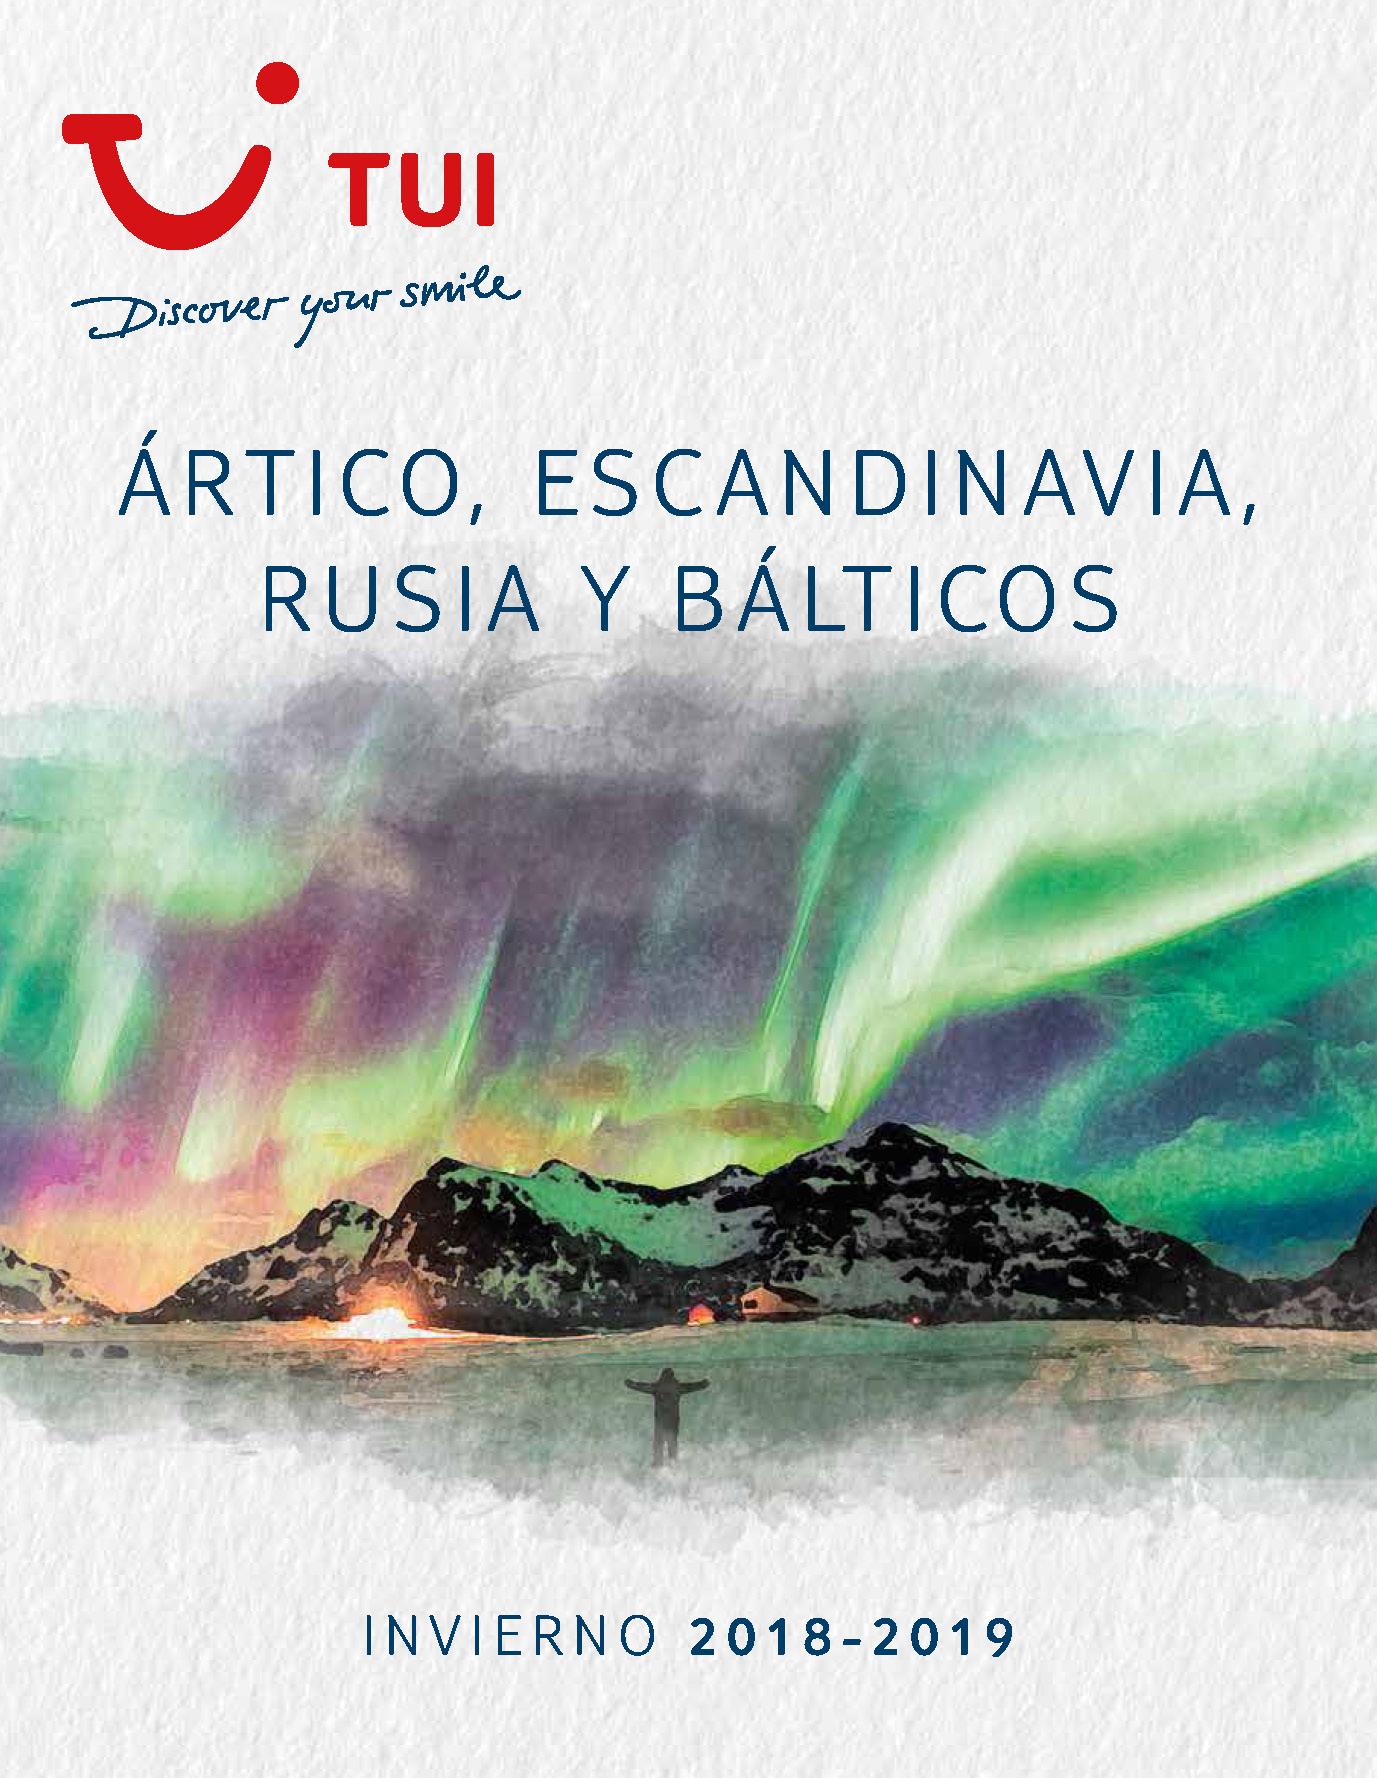 Catalogo TUI Ambassador Tours Escandinavia y Rusia Invierno 2018-2019